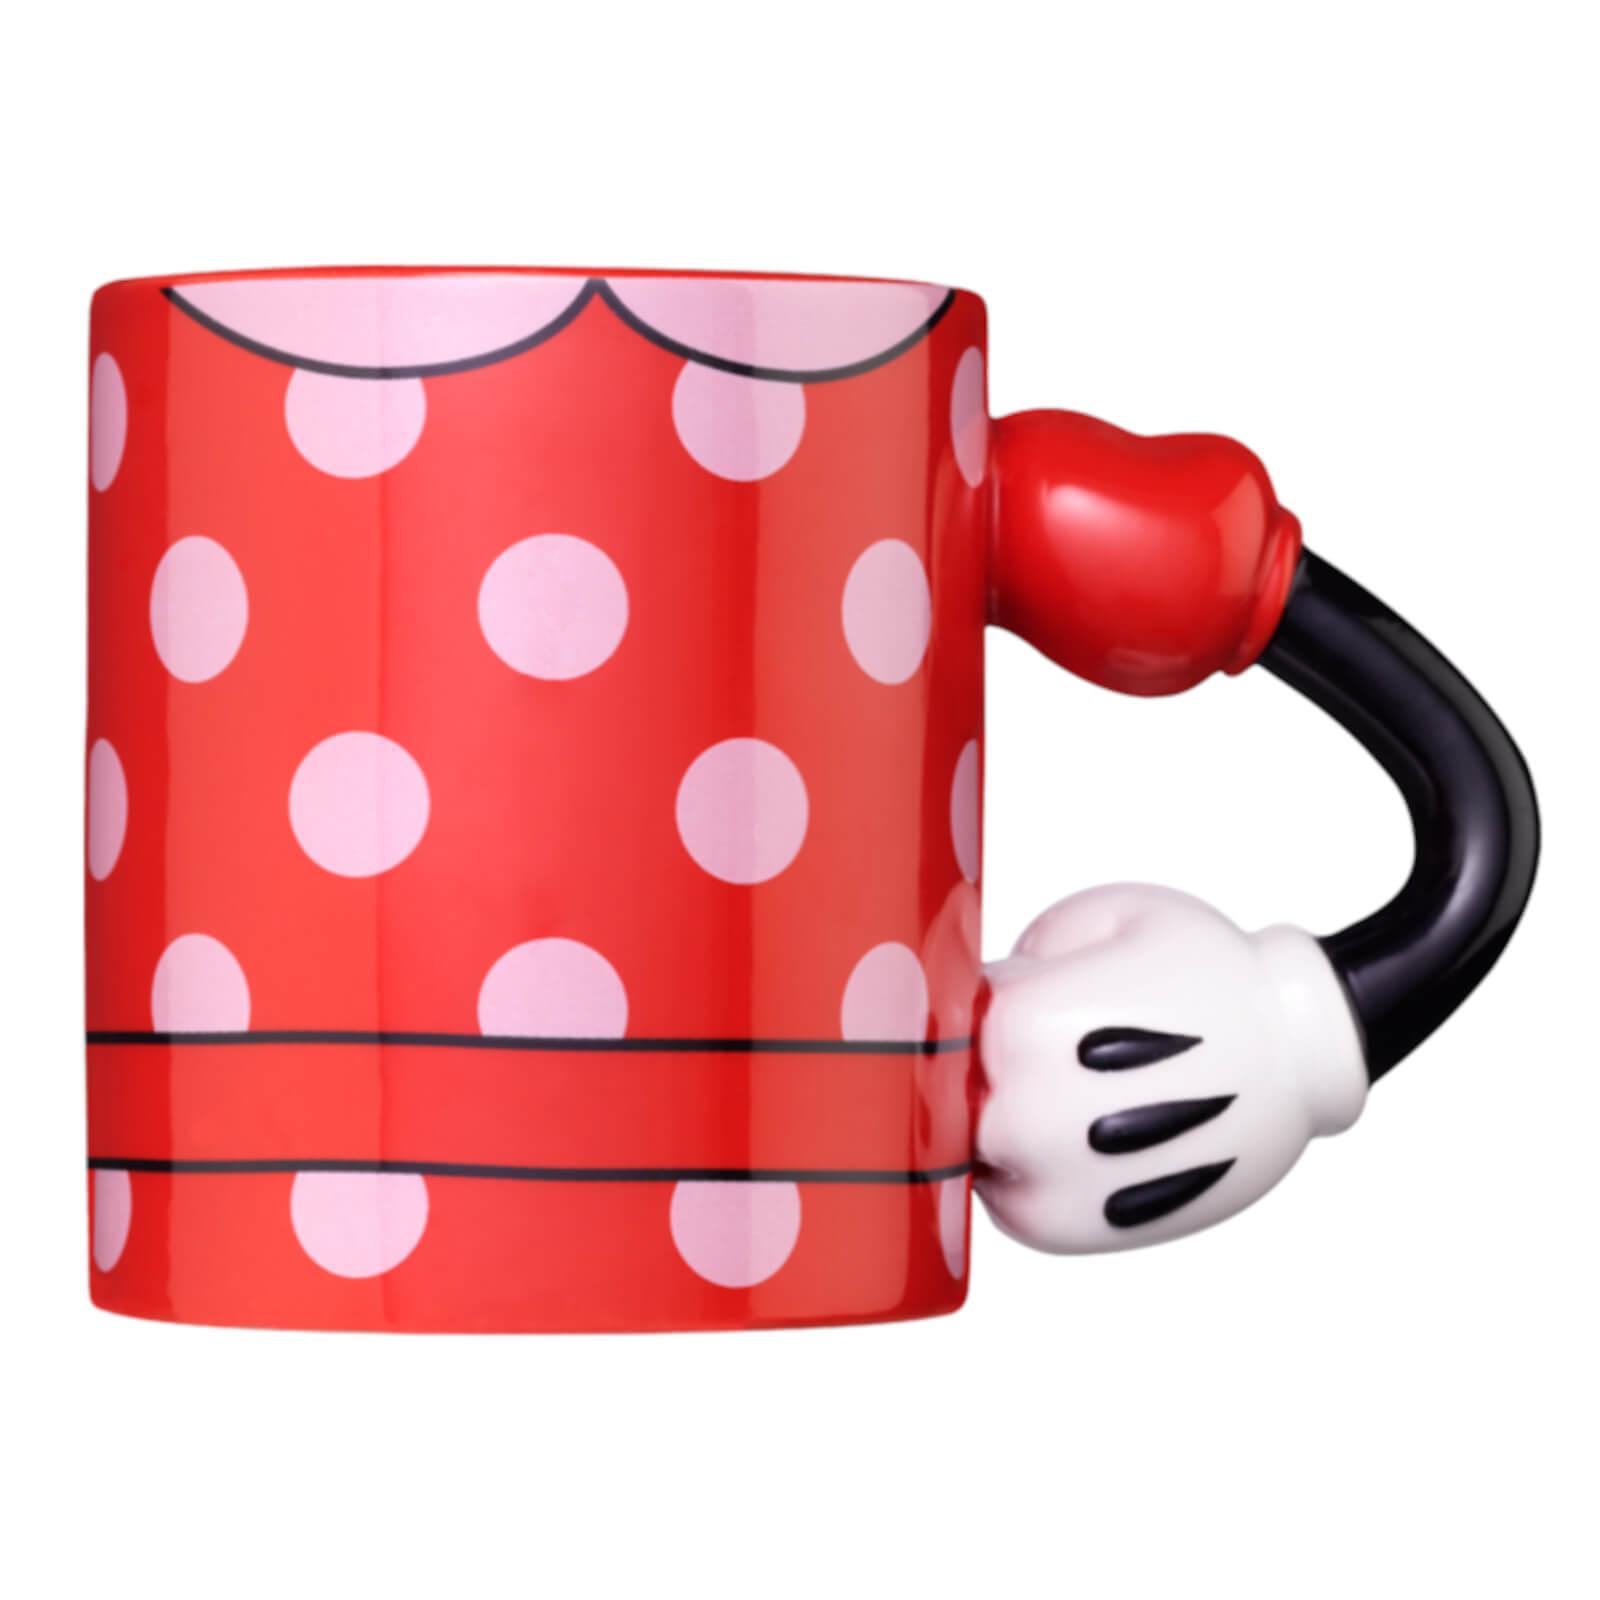 Image of Meta Merch Disney Minnie Mouse Arm Mug